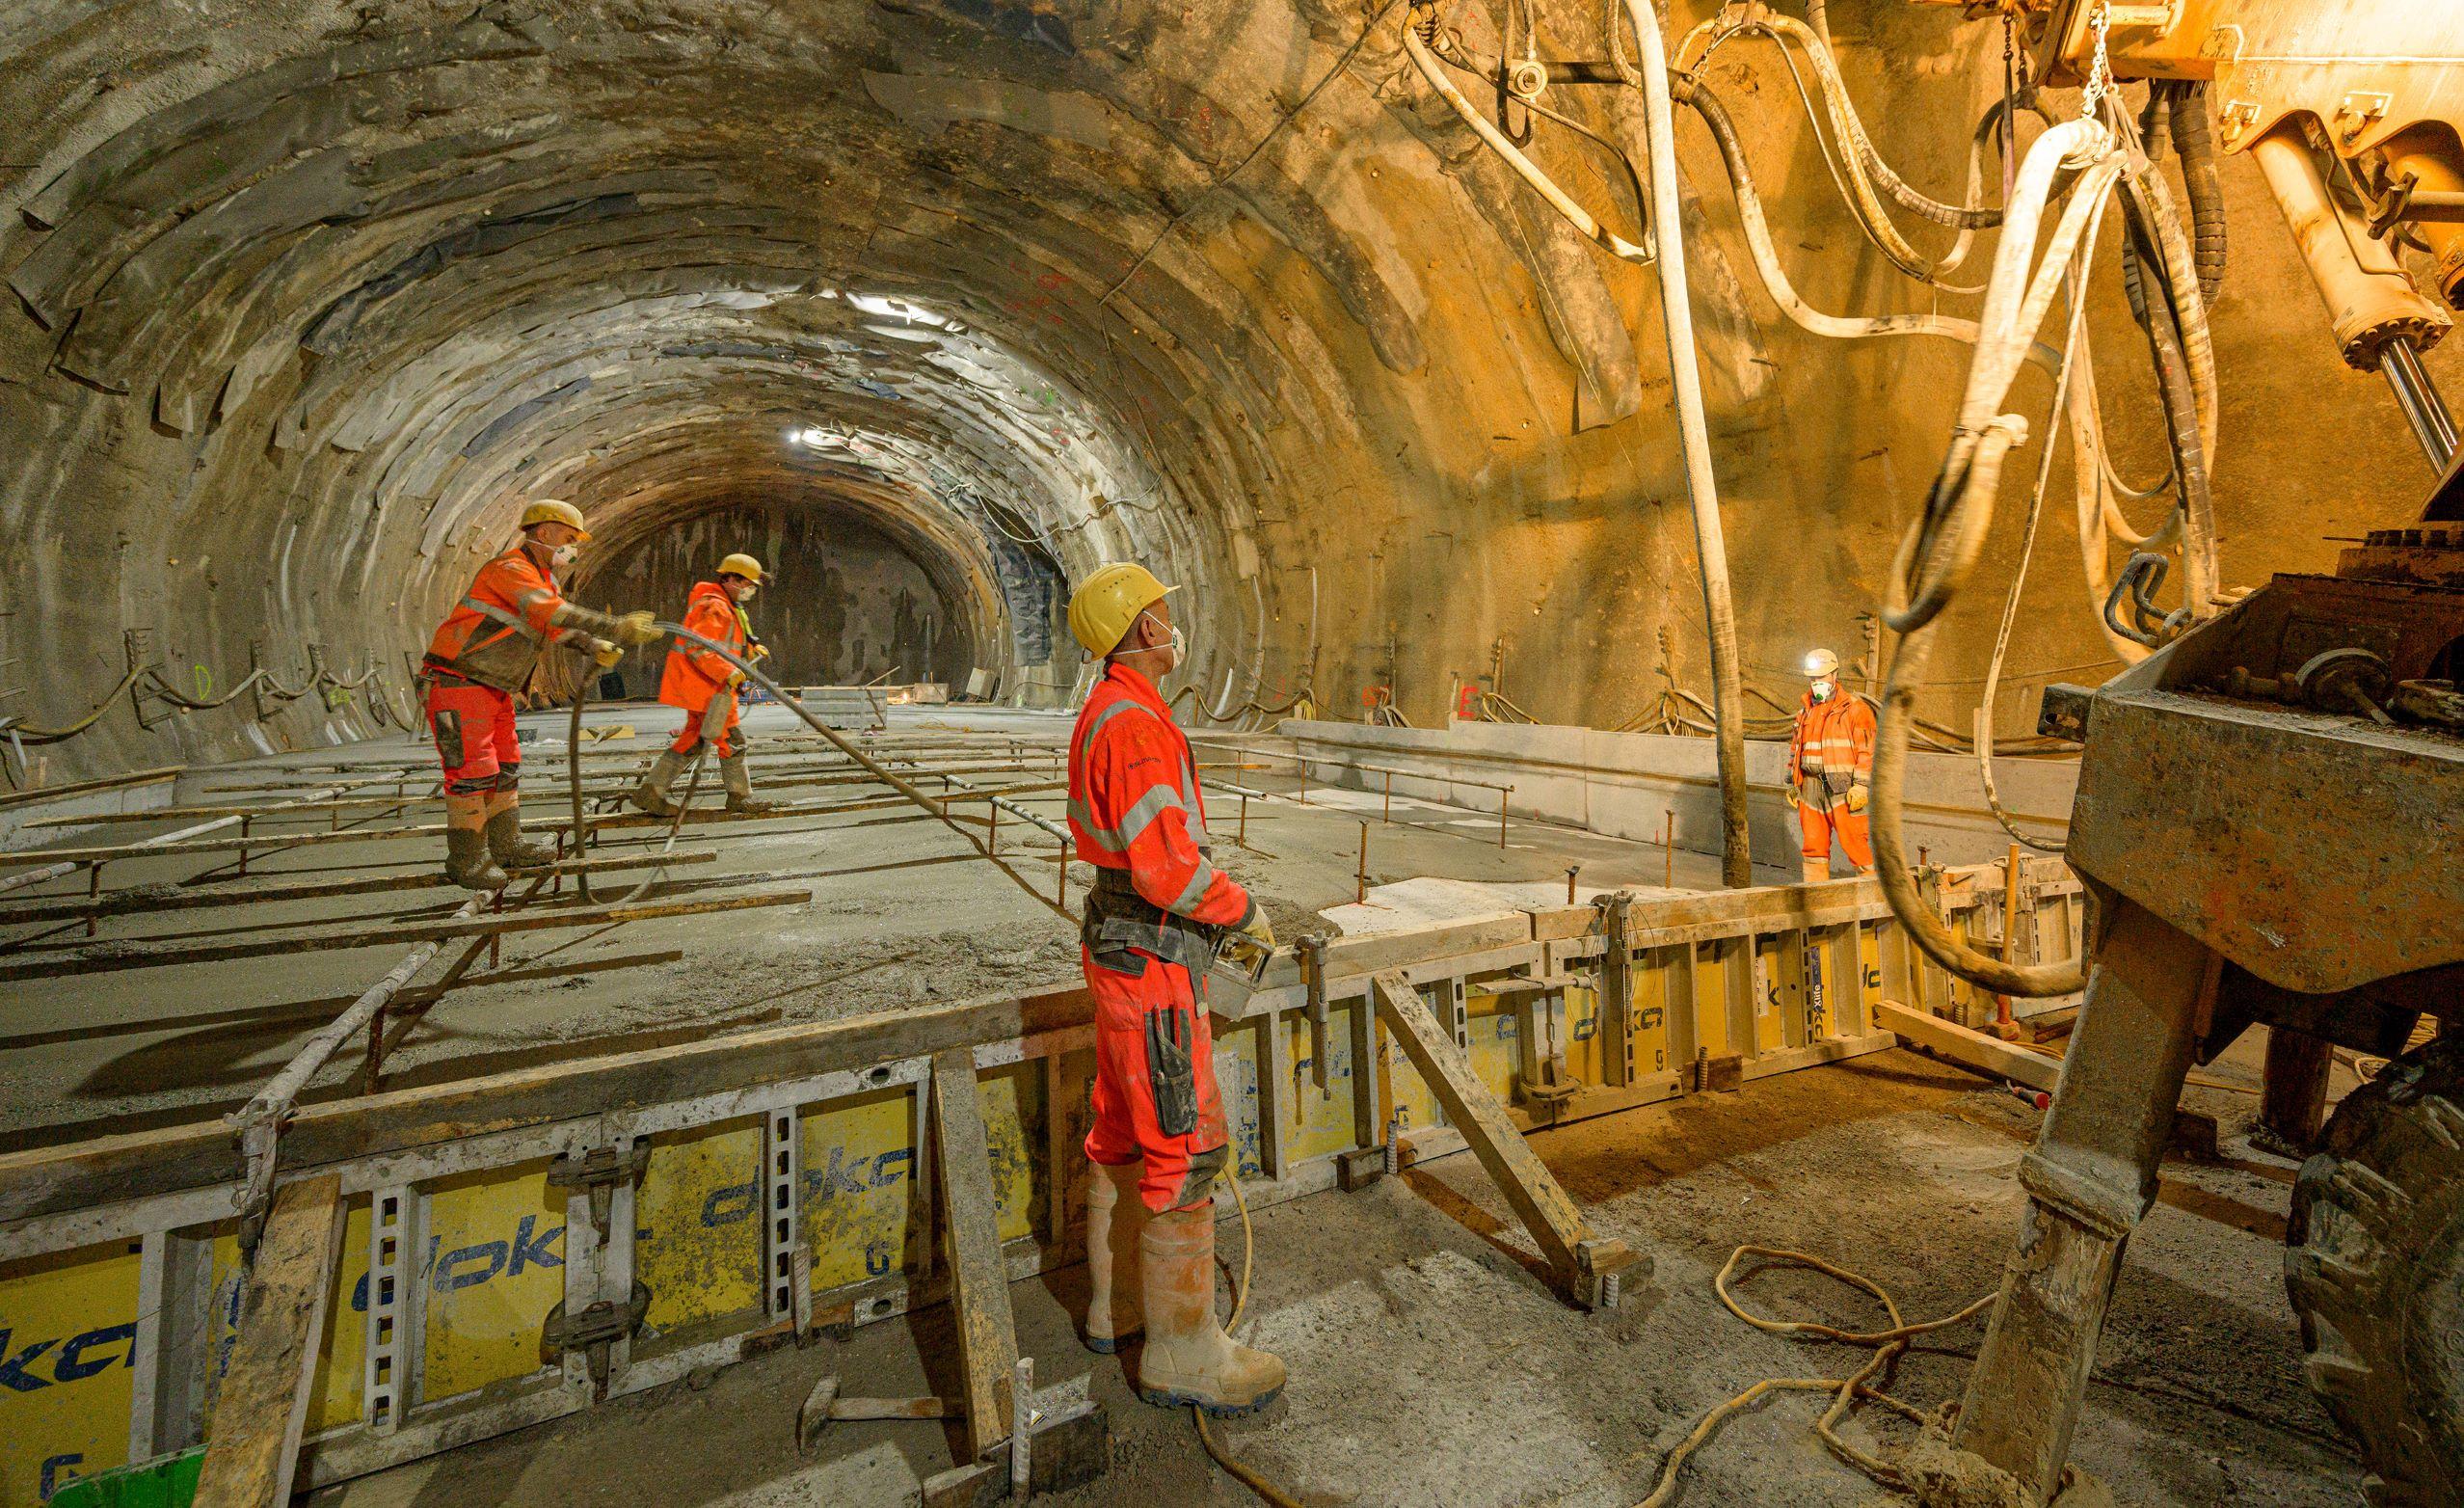 Semmering Base Tunnel at Göstritz